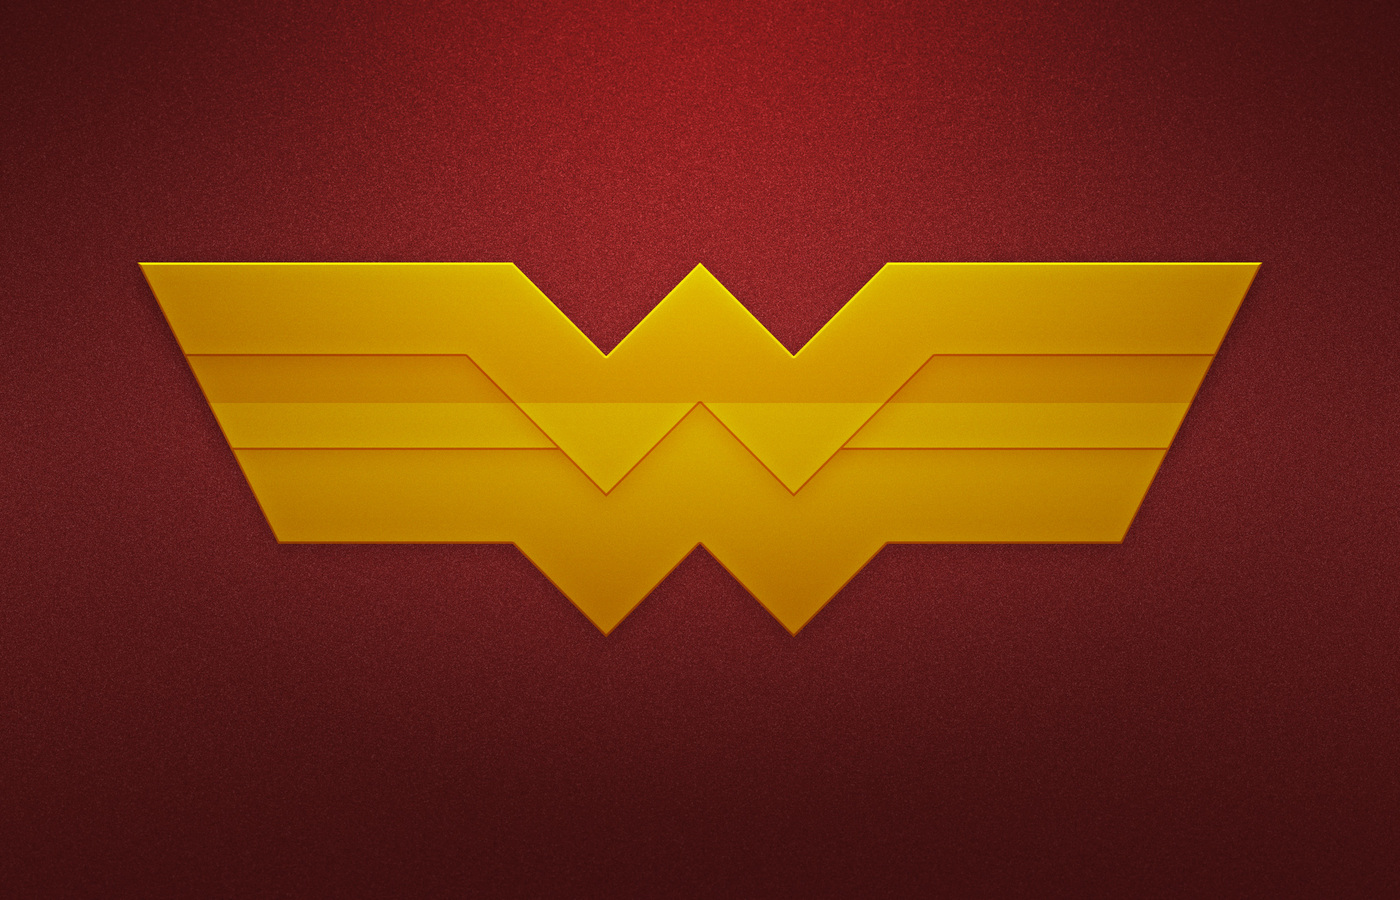 wonder-woman-logo-art-8p.jpg